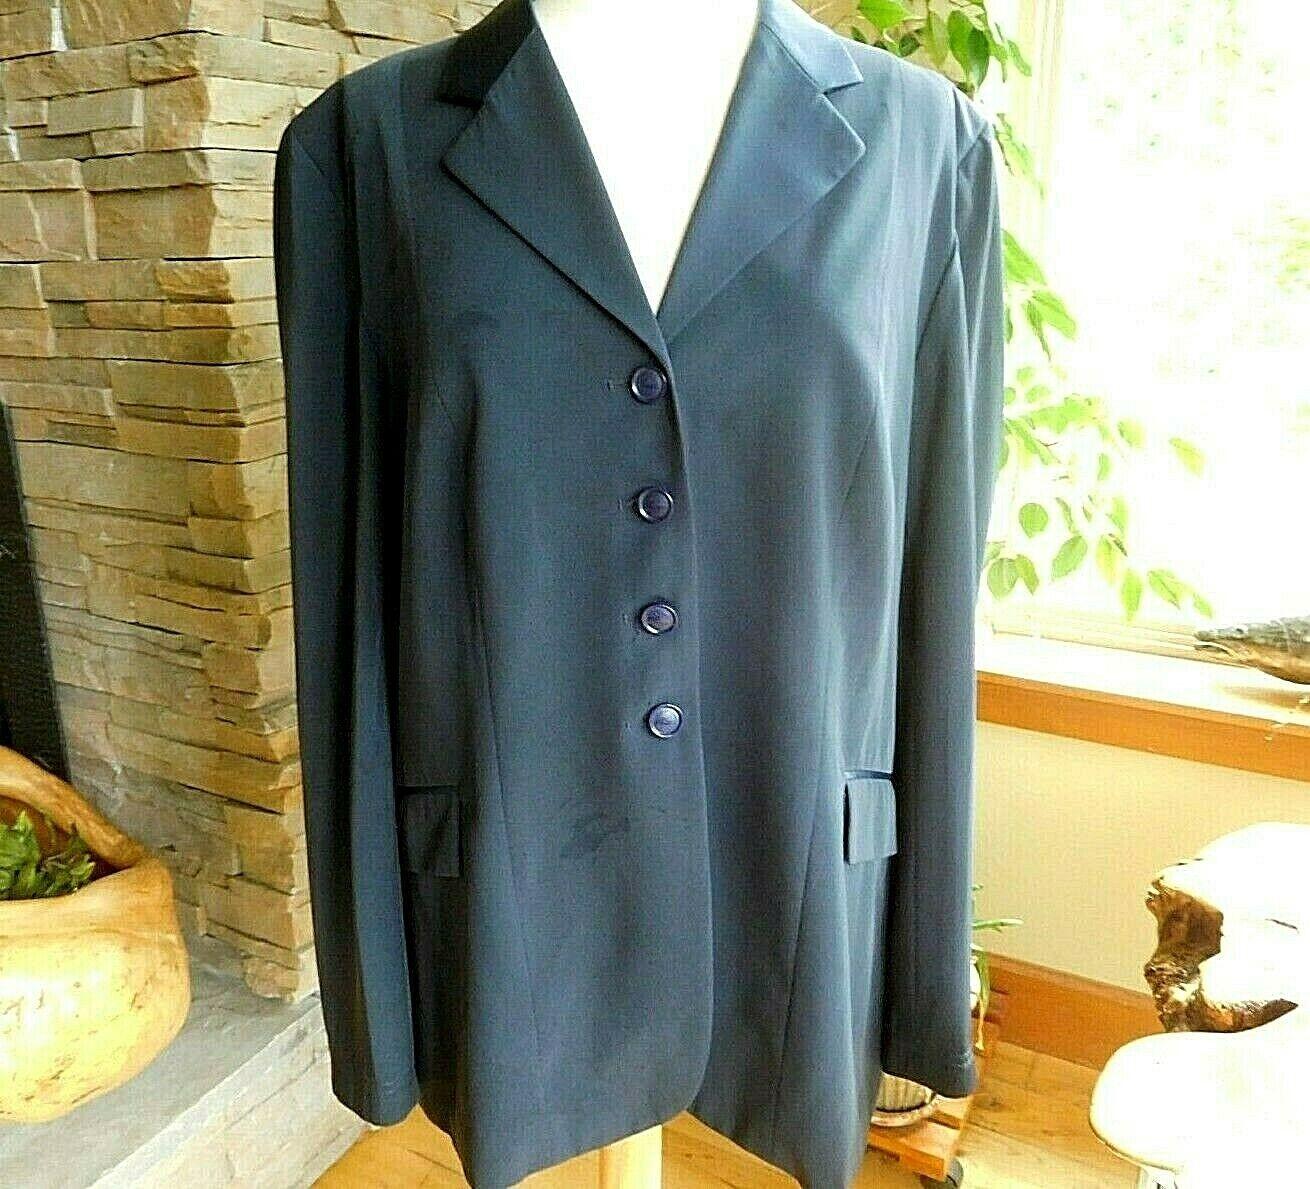 Grand Prix TechLite Show Coat 20 Tall US Ladies 14T Navy Silky Collar EJ44